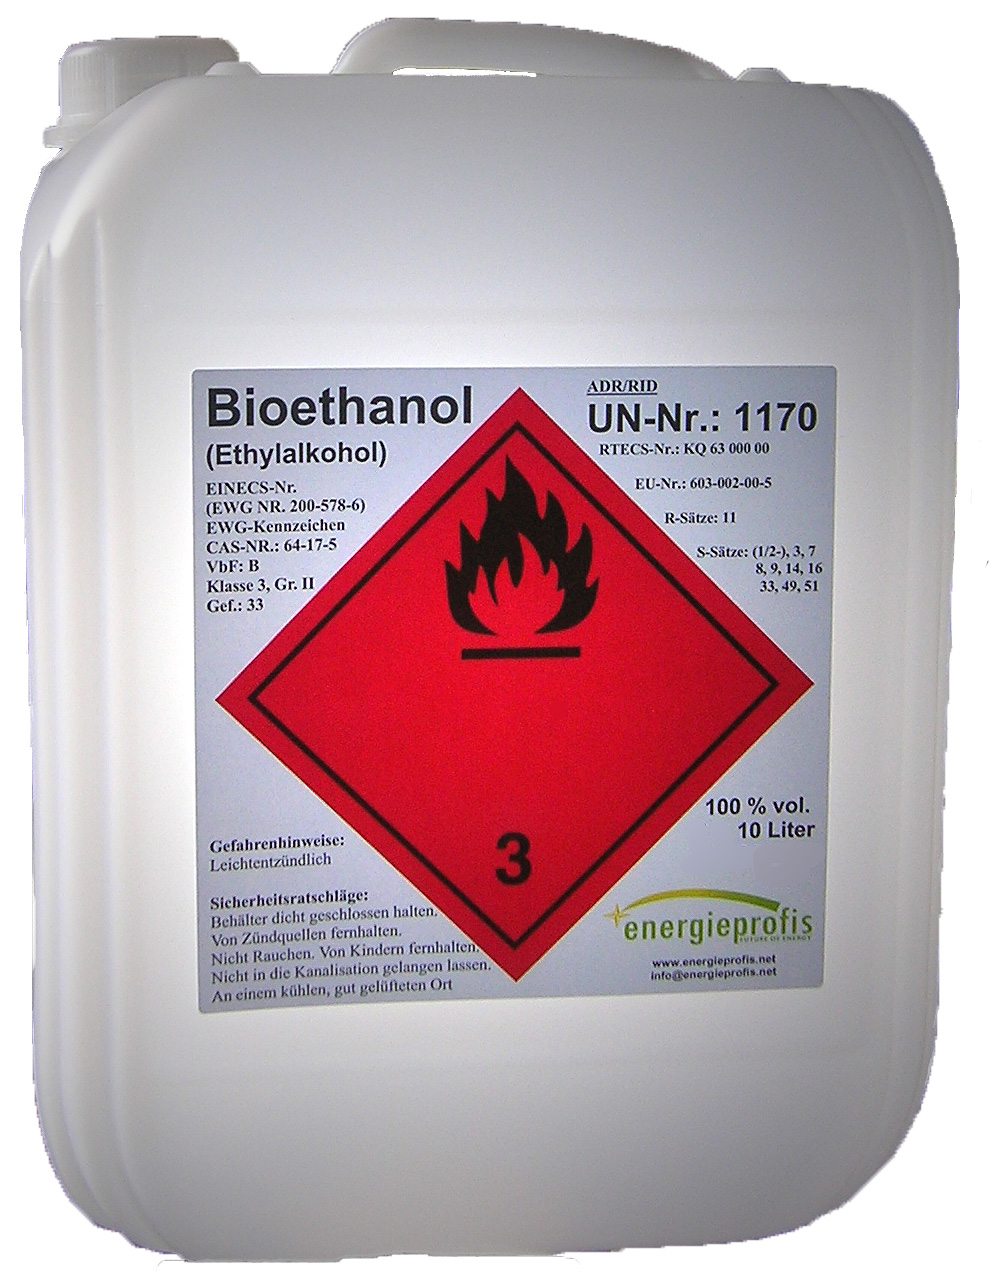 20 liter kamin bioethanol 100 in kanistern versandkostenfrei energieprofis. Black Bedroom Furniture Sets. Home Design Ideas